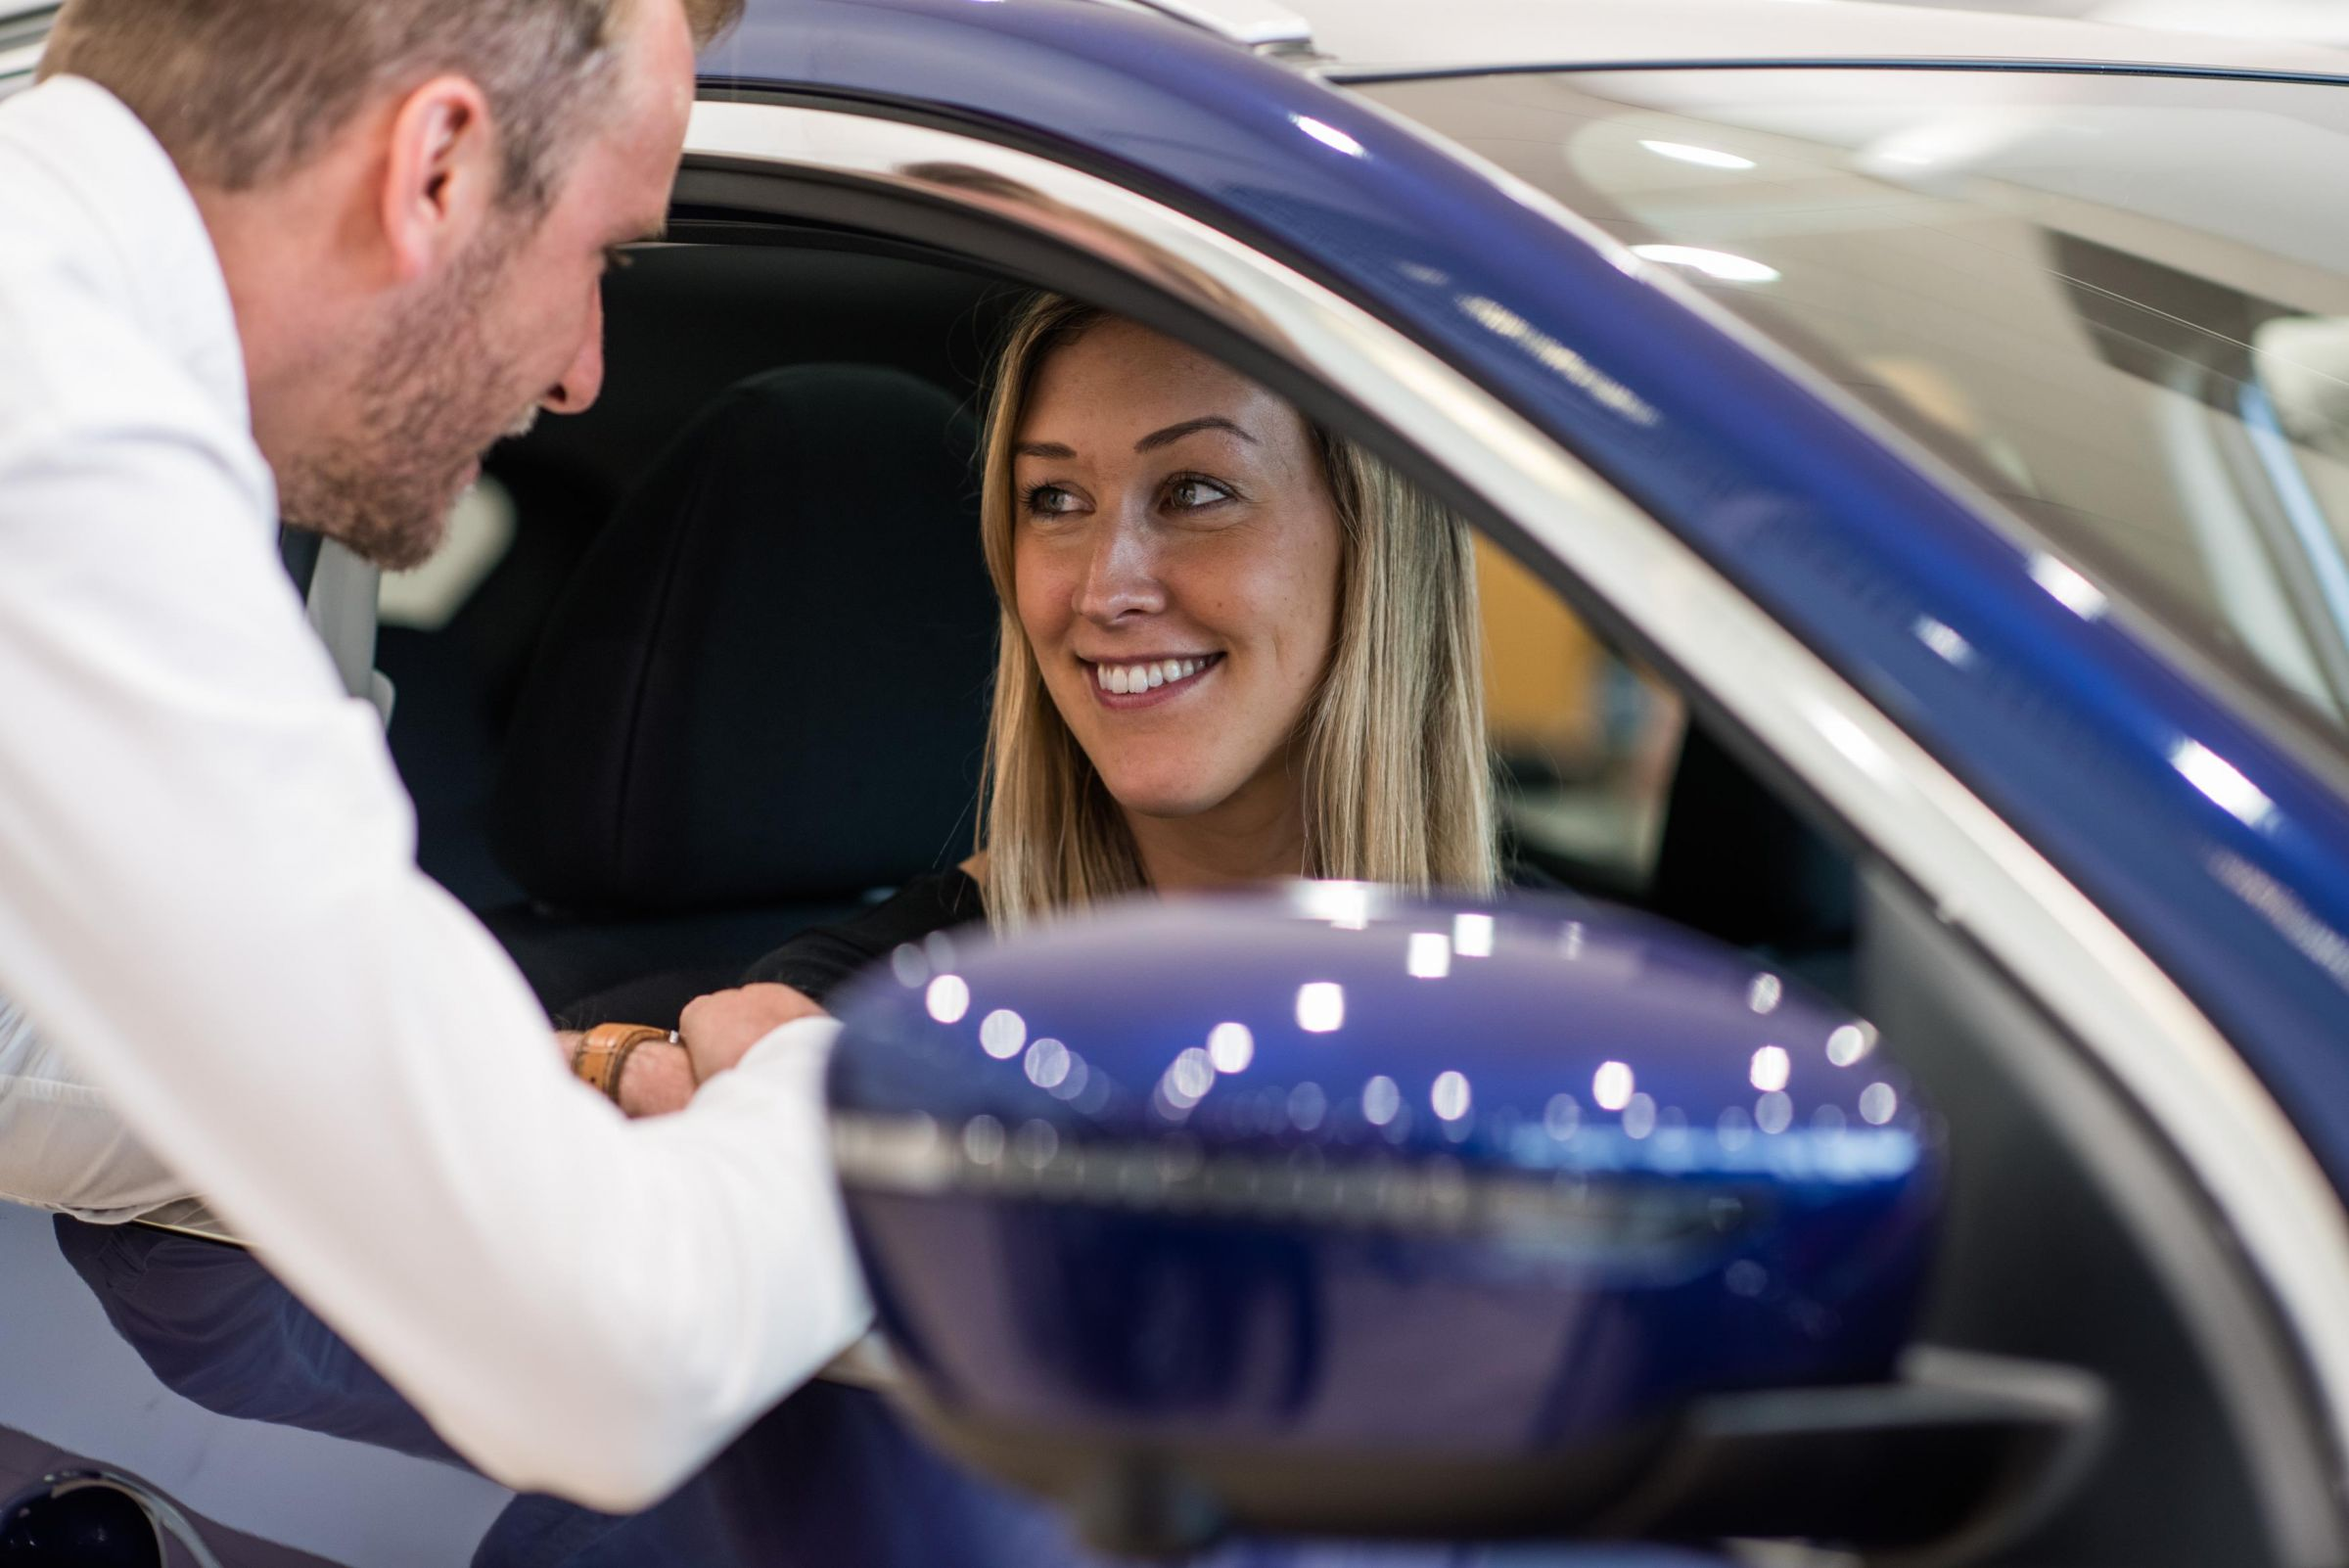 UK New Vehicle Registrations Down